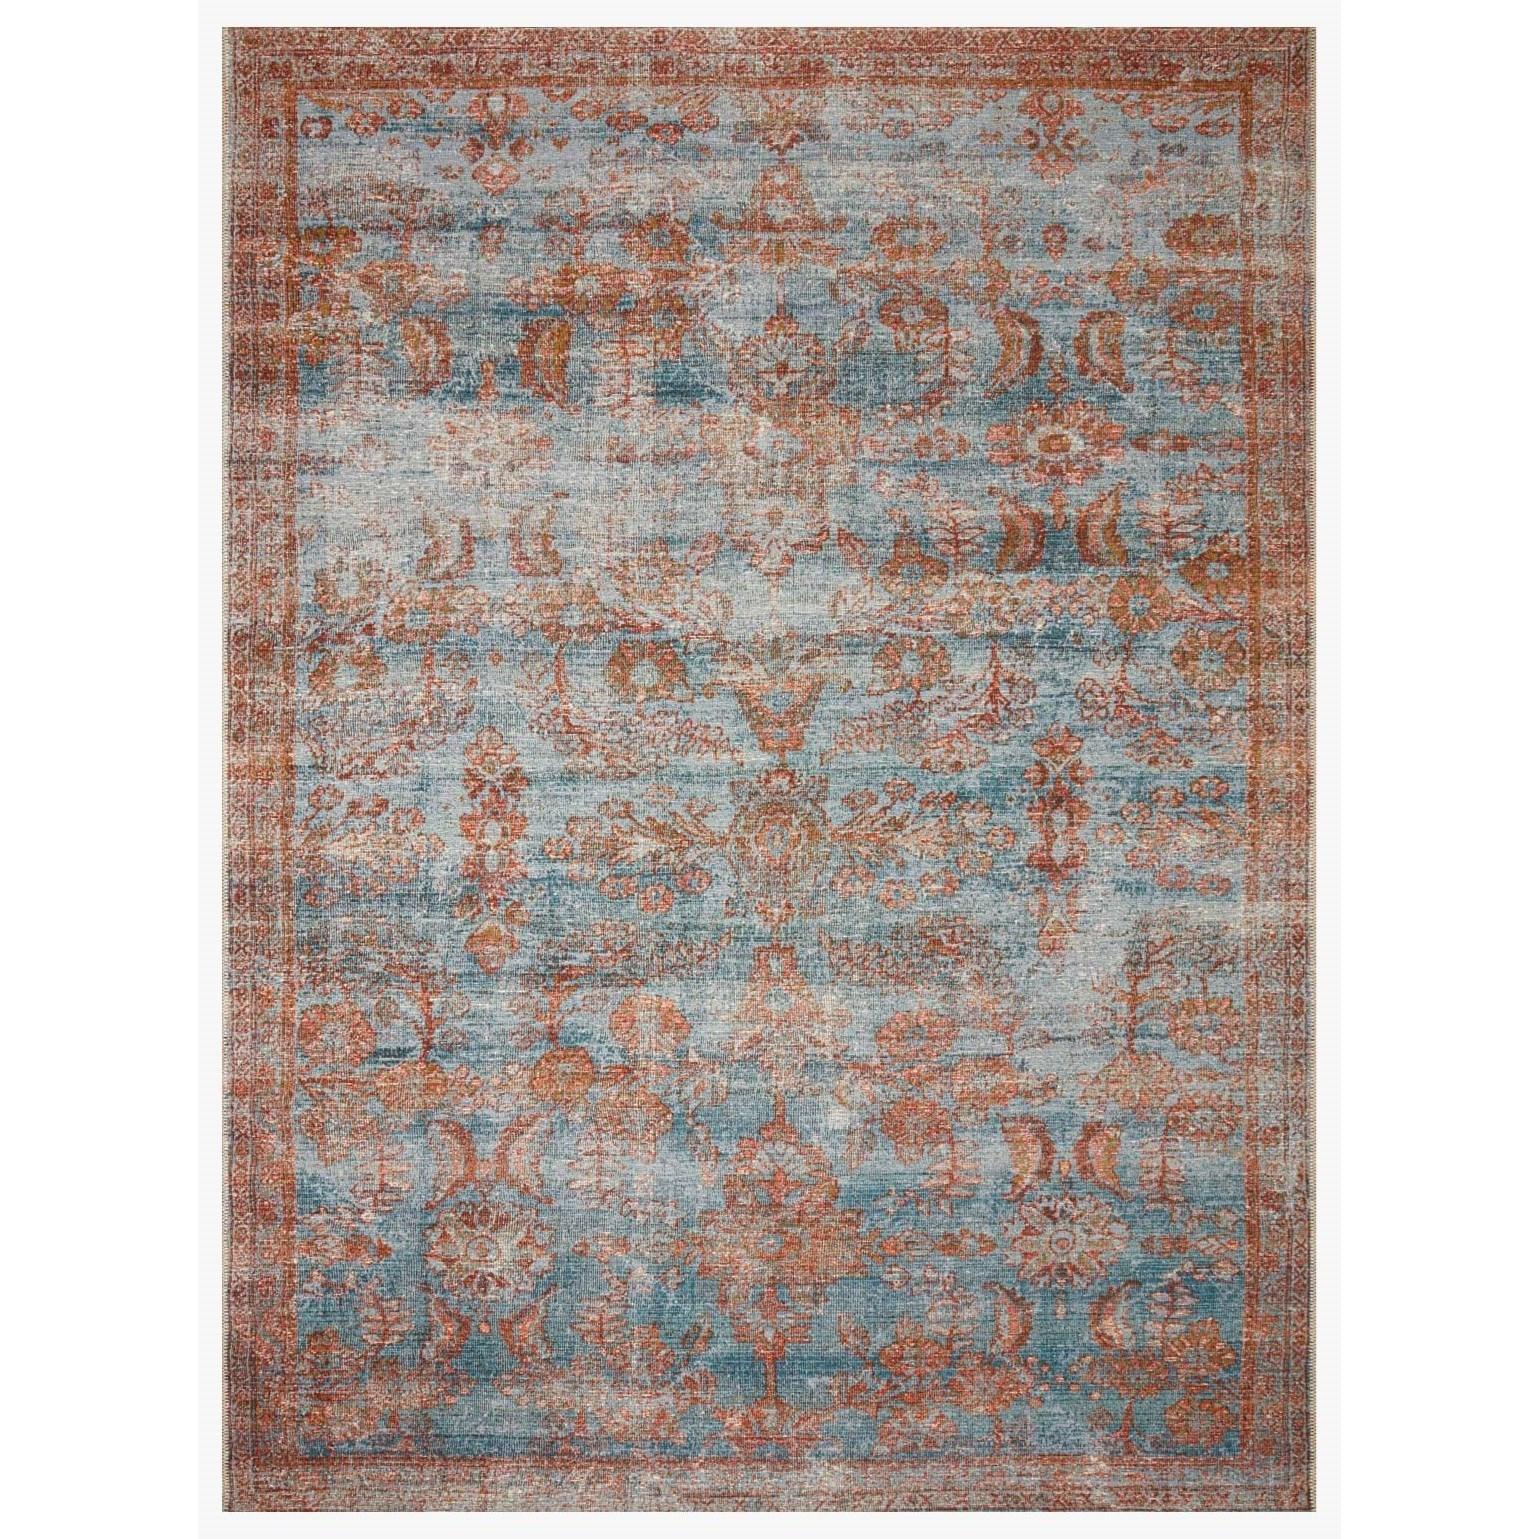 "Sebastian 10'6"" x 13'9"" Ocean / Spice Rug by Loloi Rugs at Virginia Furniture Market"